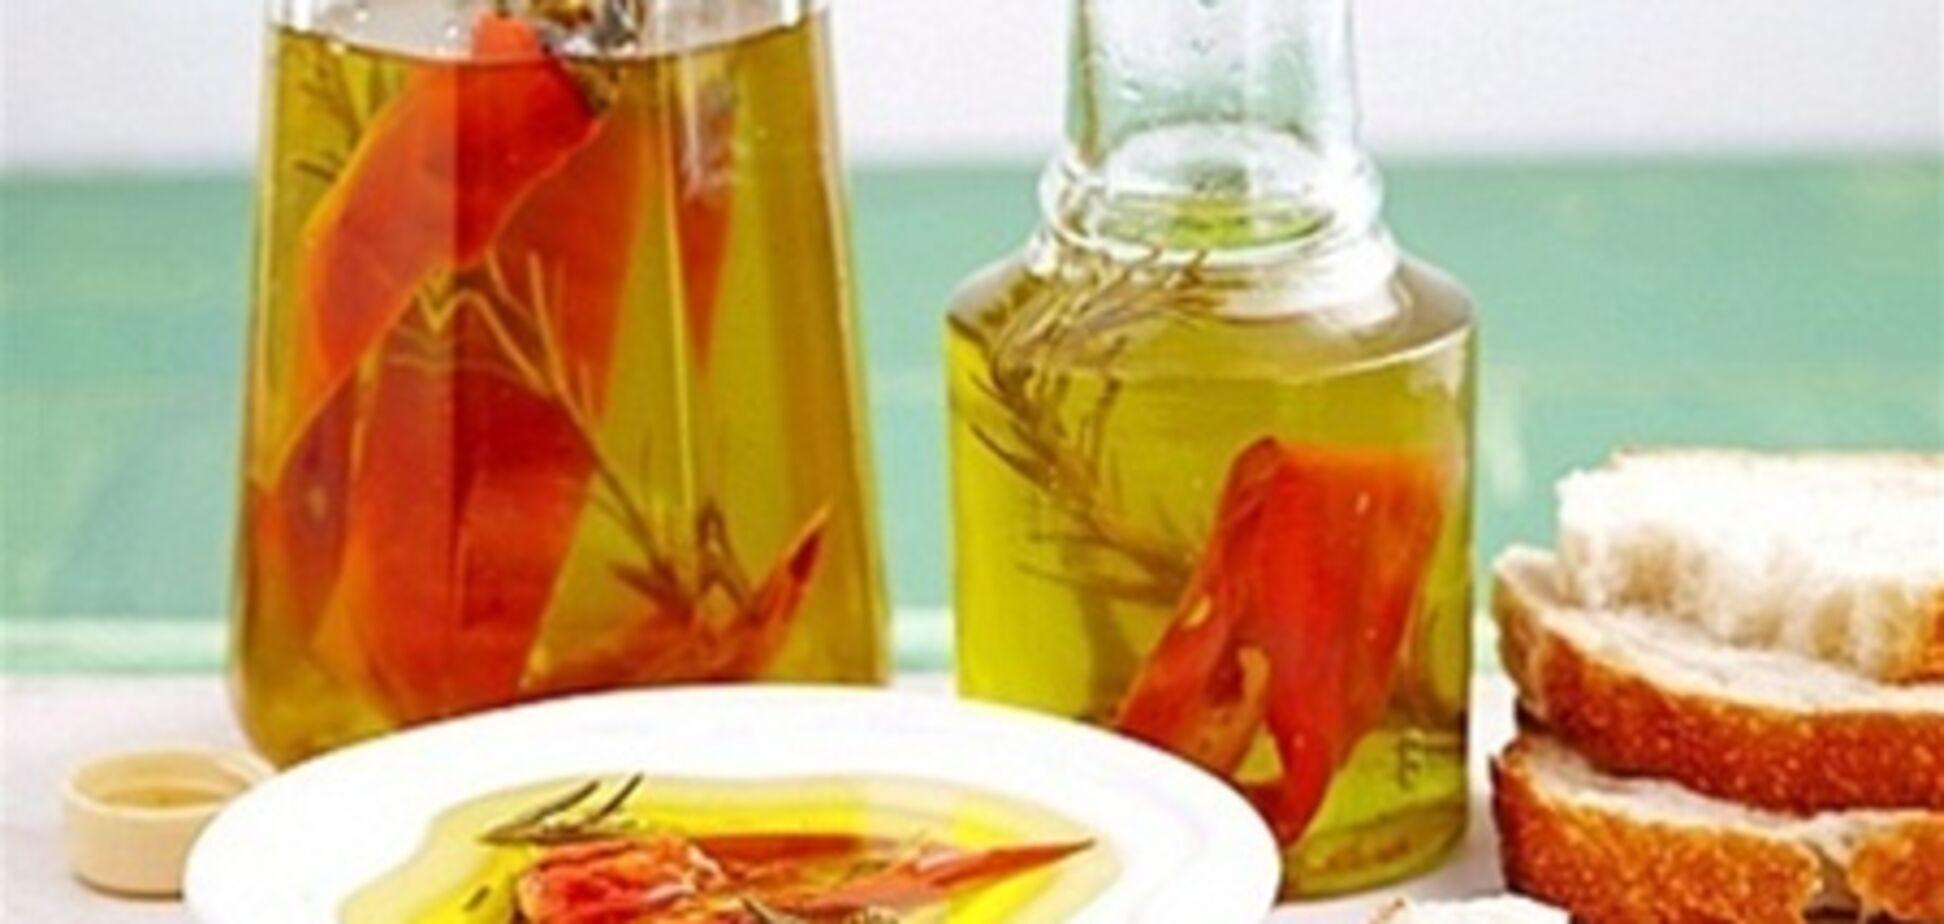 Розмариновое масло